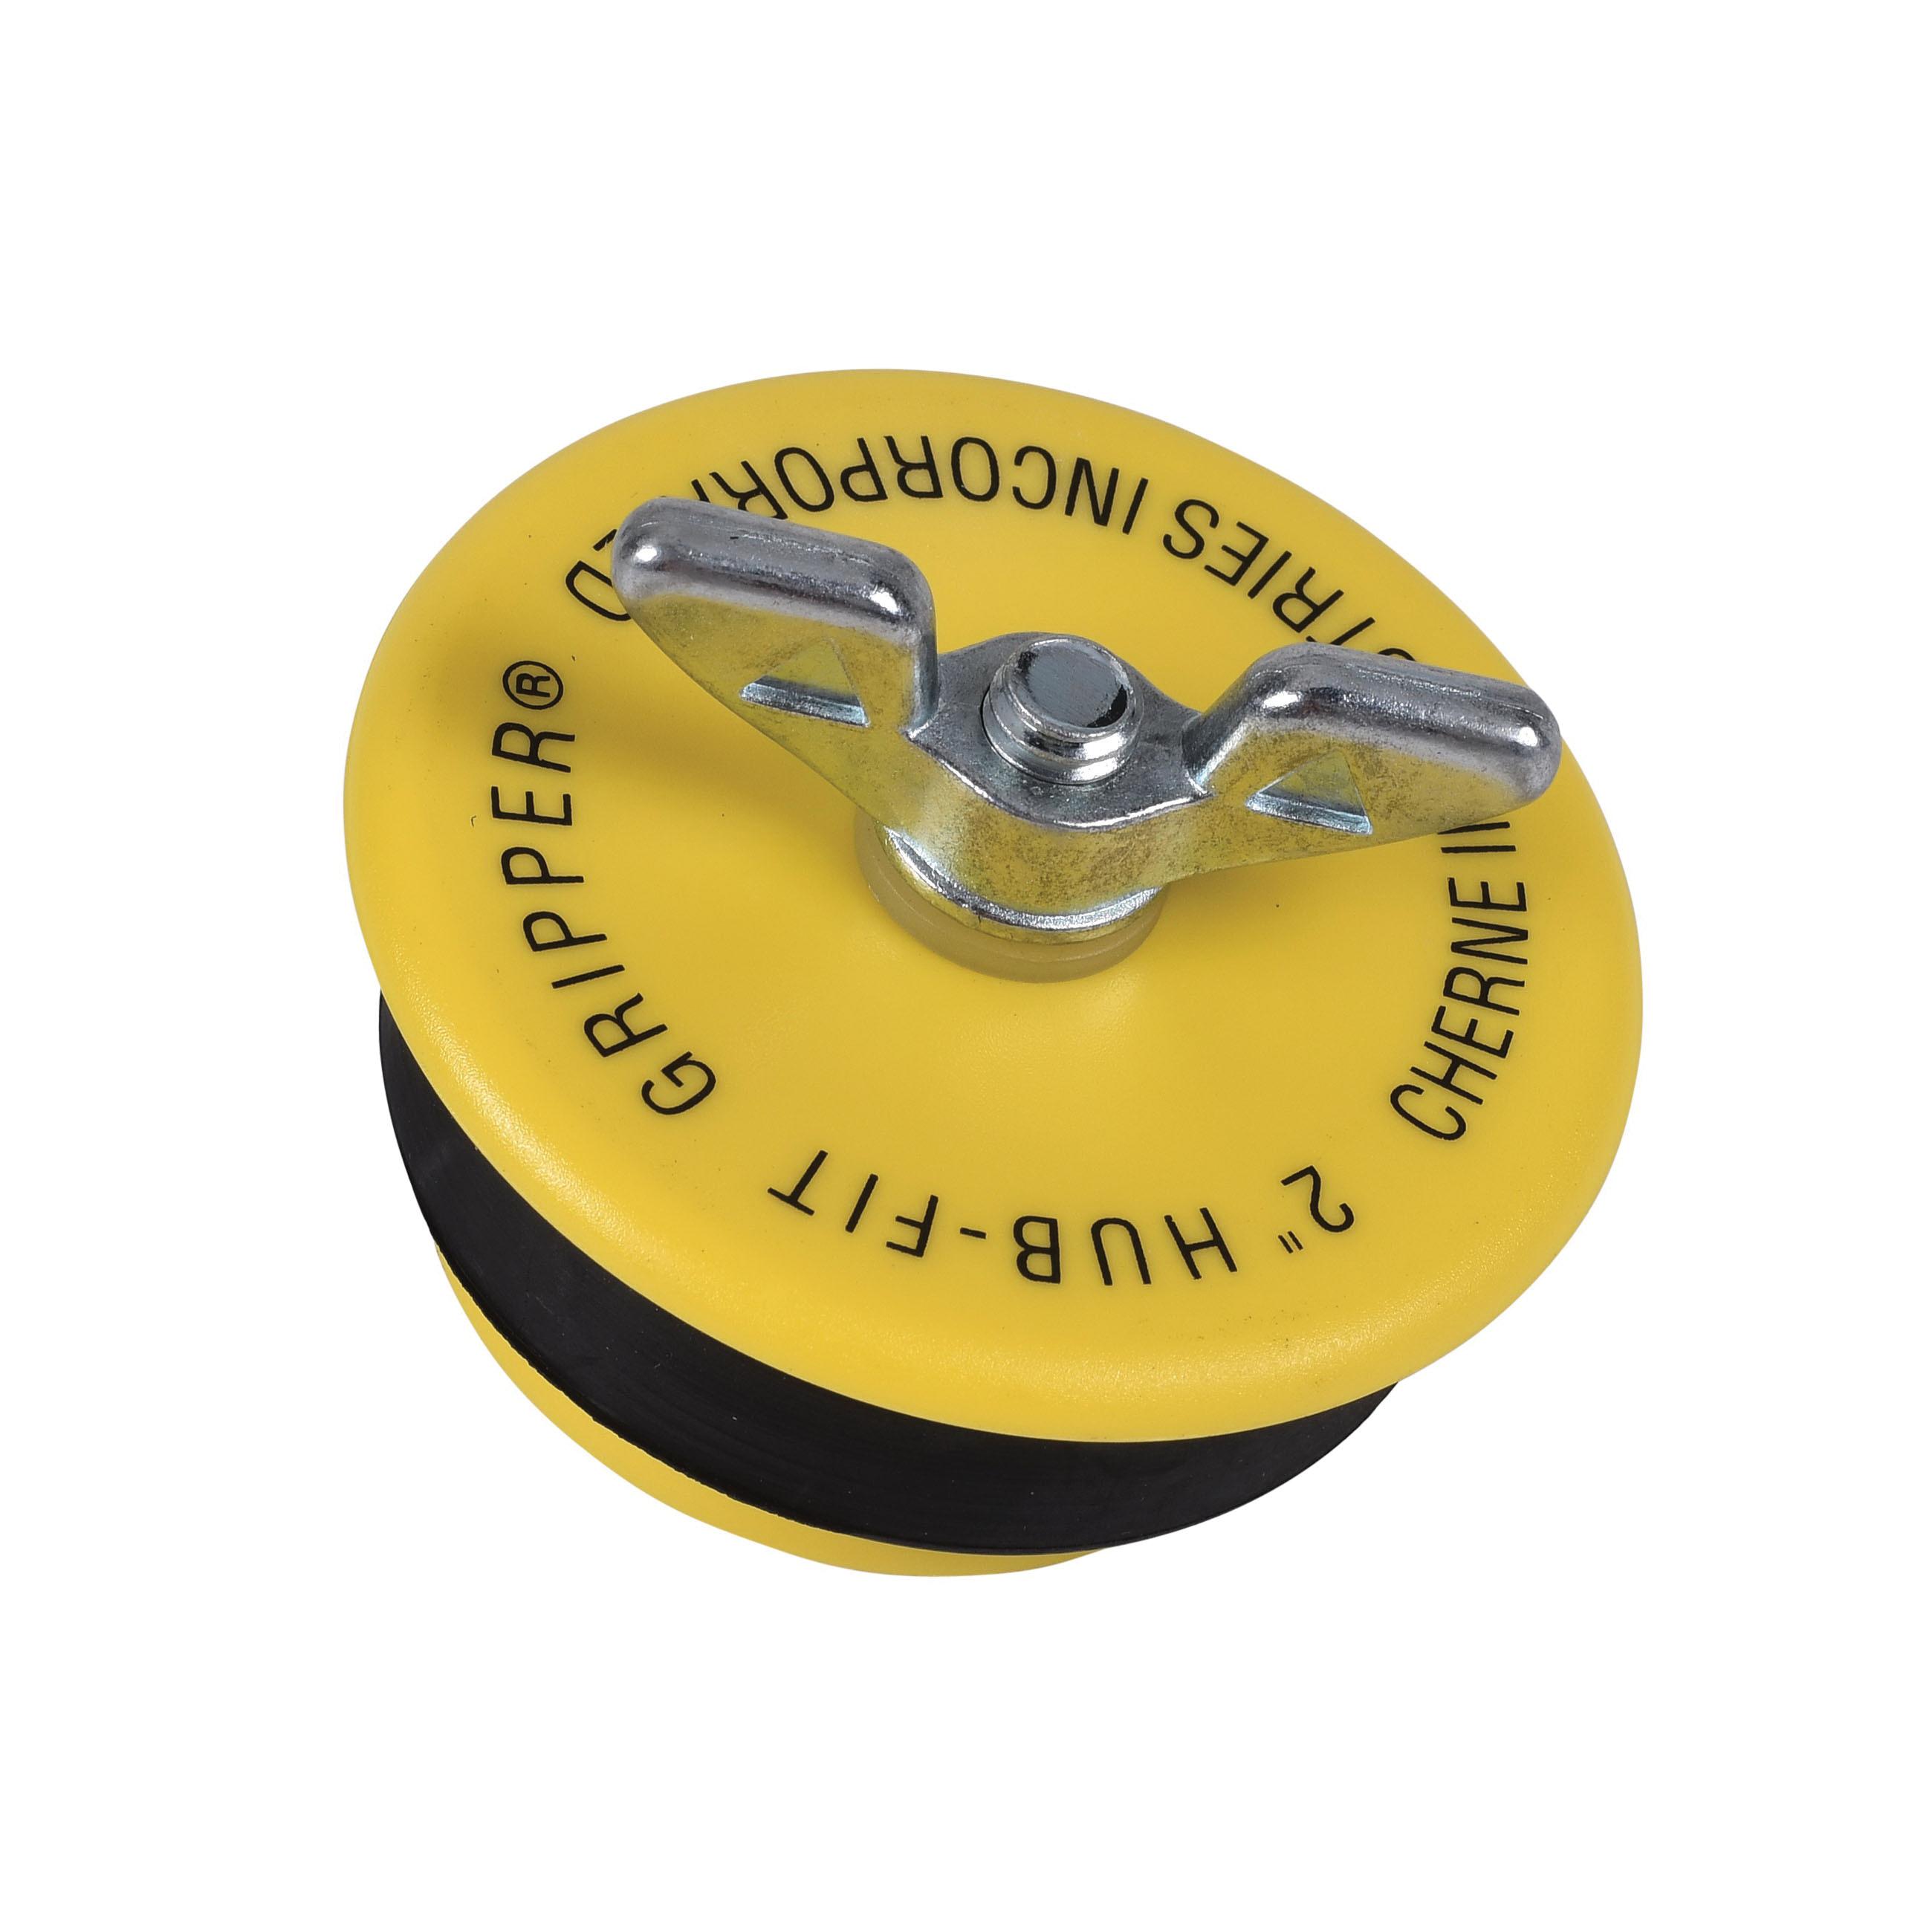 Cherne® Hub-Fit Gripper® 270528 Mechanical Pipe Plug, 2 in, ABS